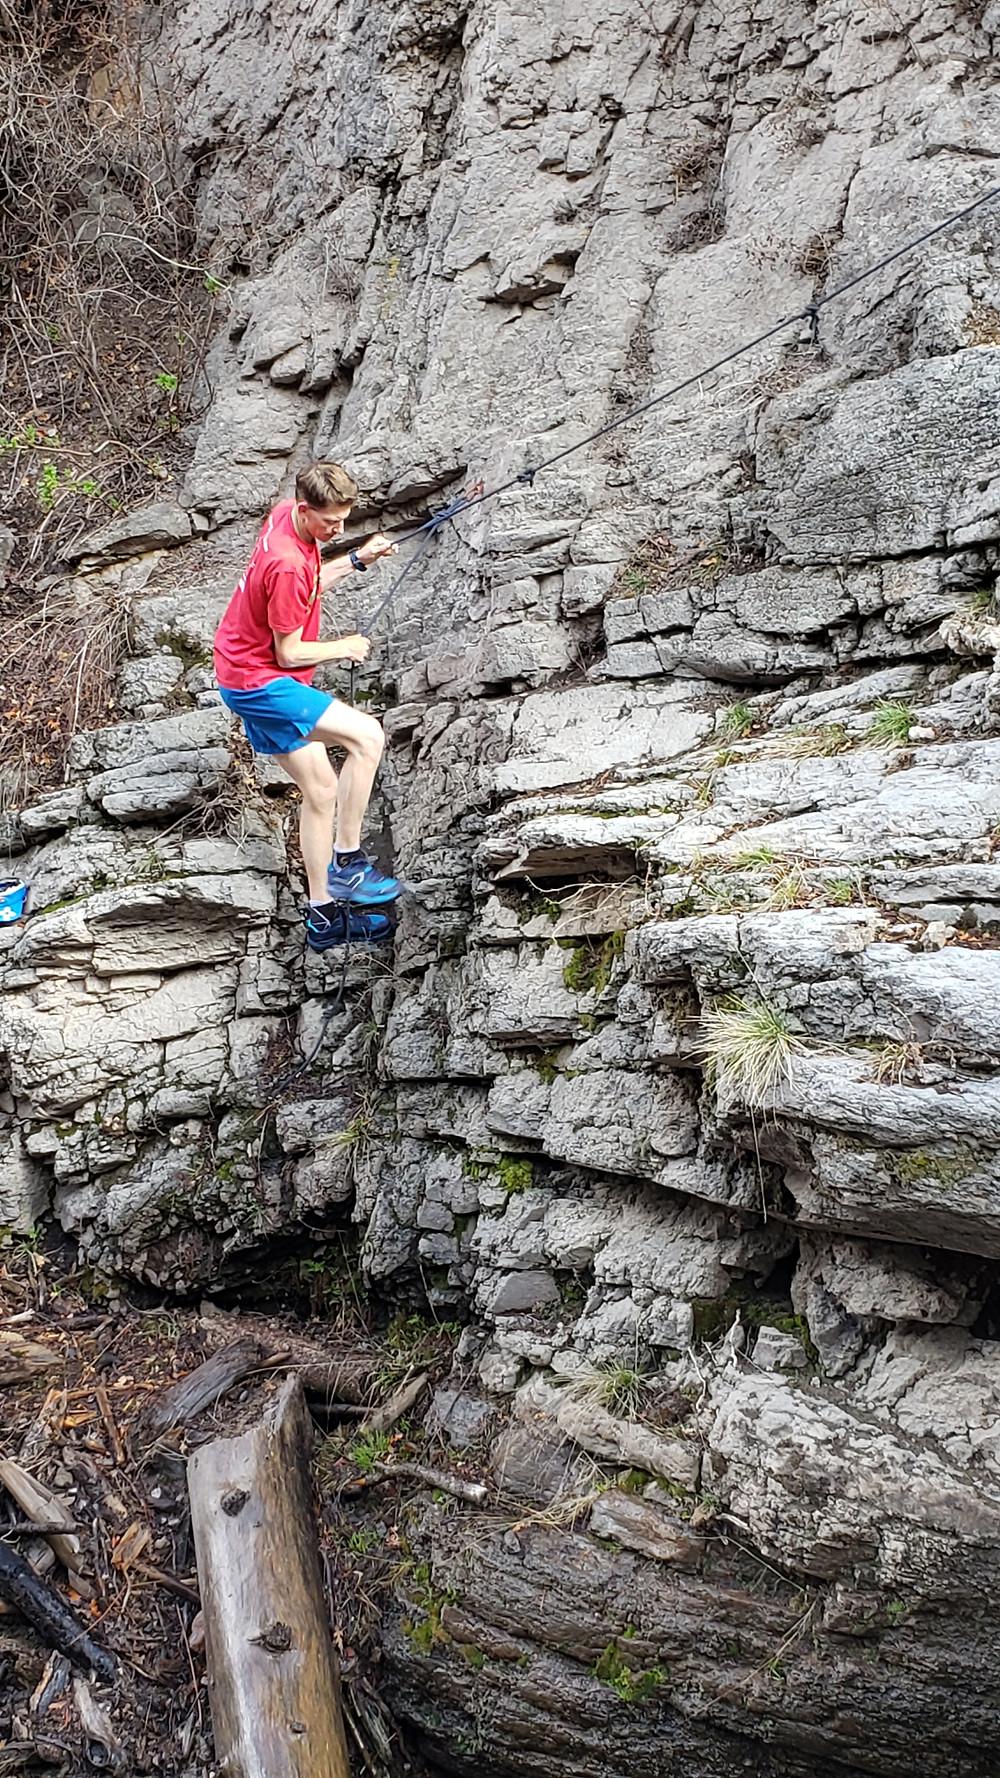 The short climb up to the ledge